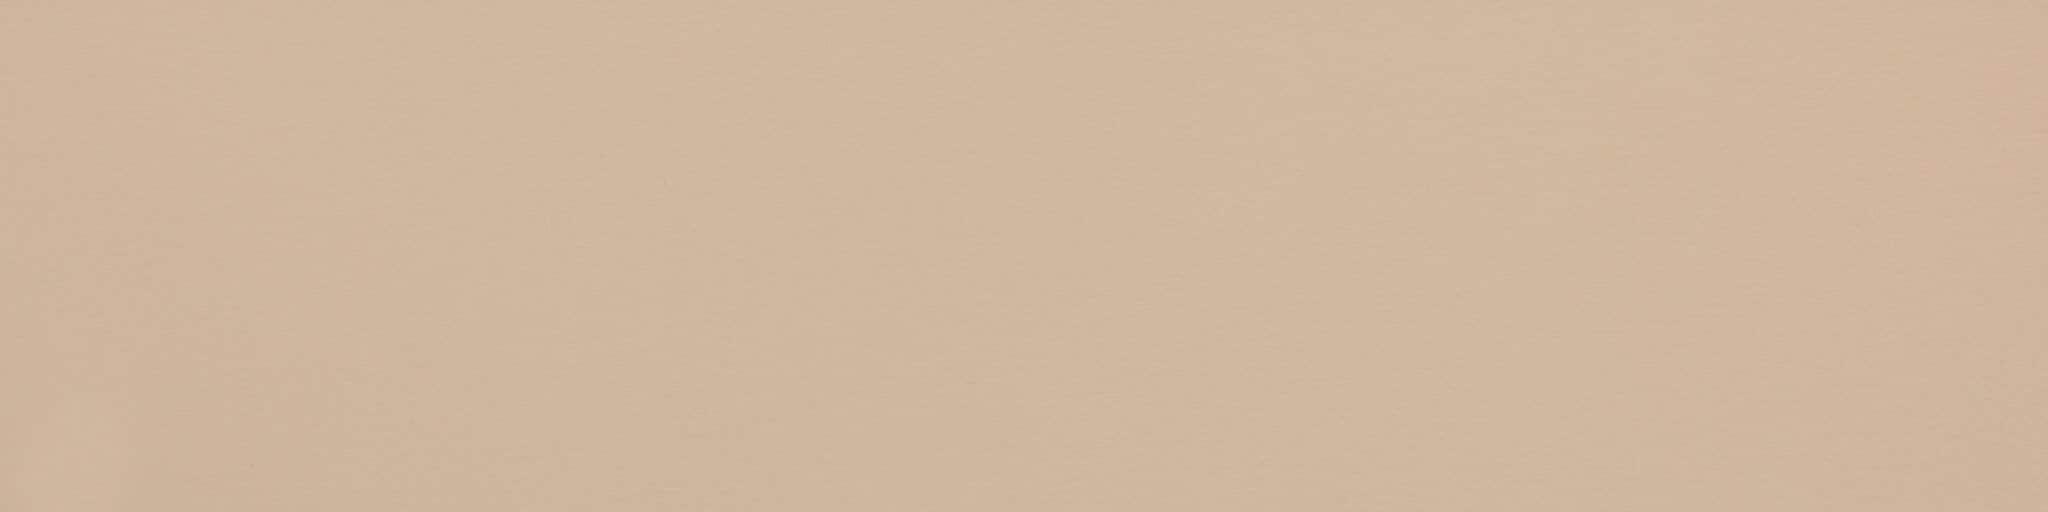 Houten jaloezie 'Plus' 301609 – Pure wood- Croissant – Max 2650 mm breed